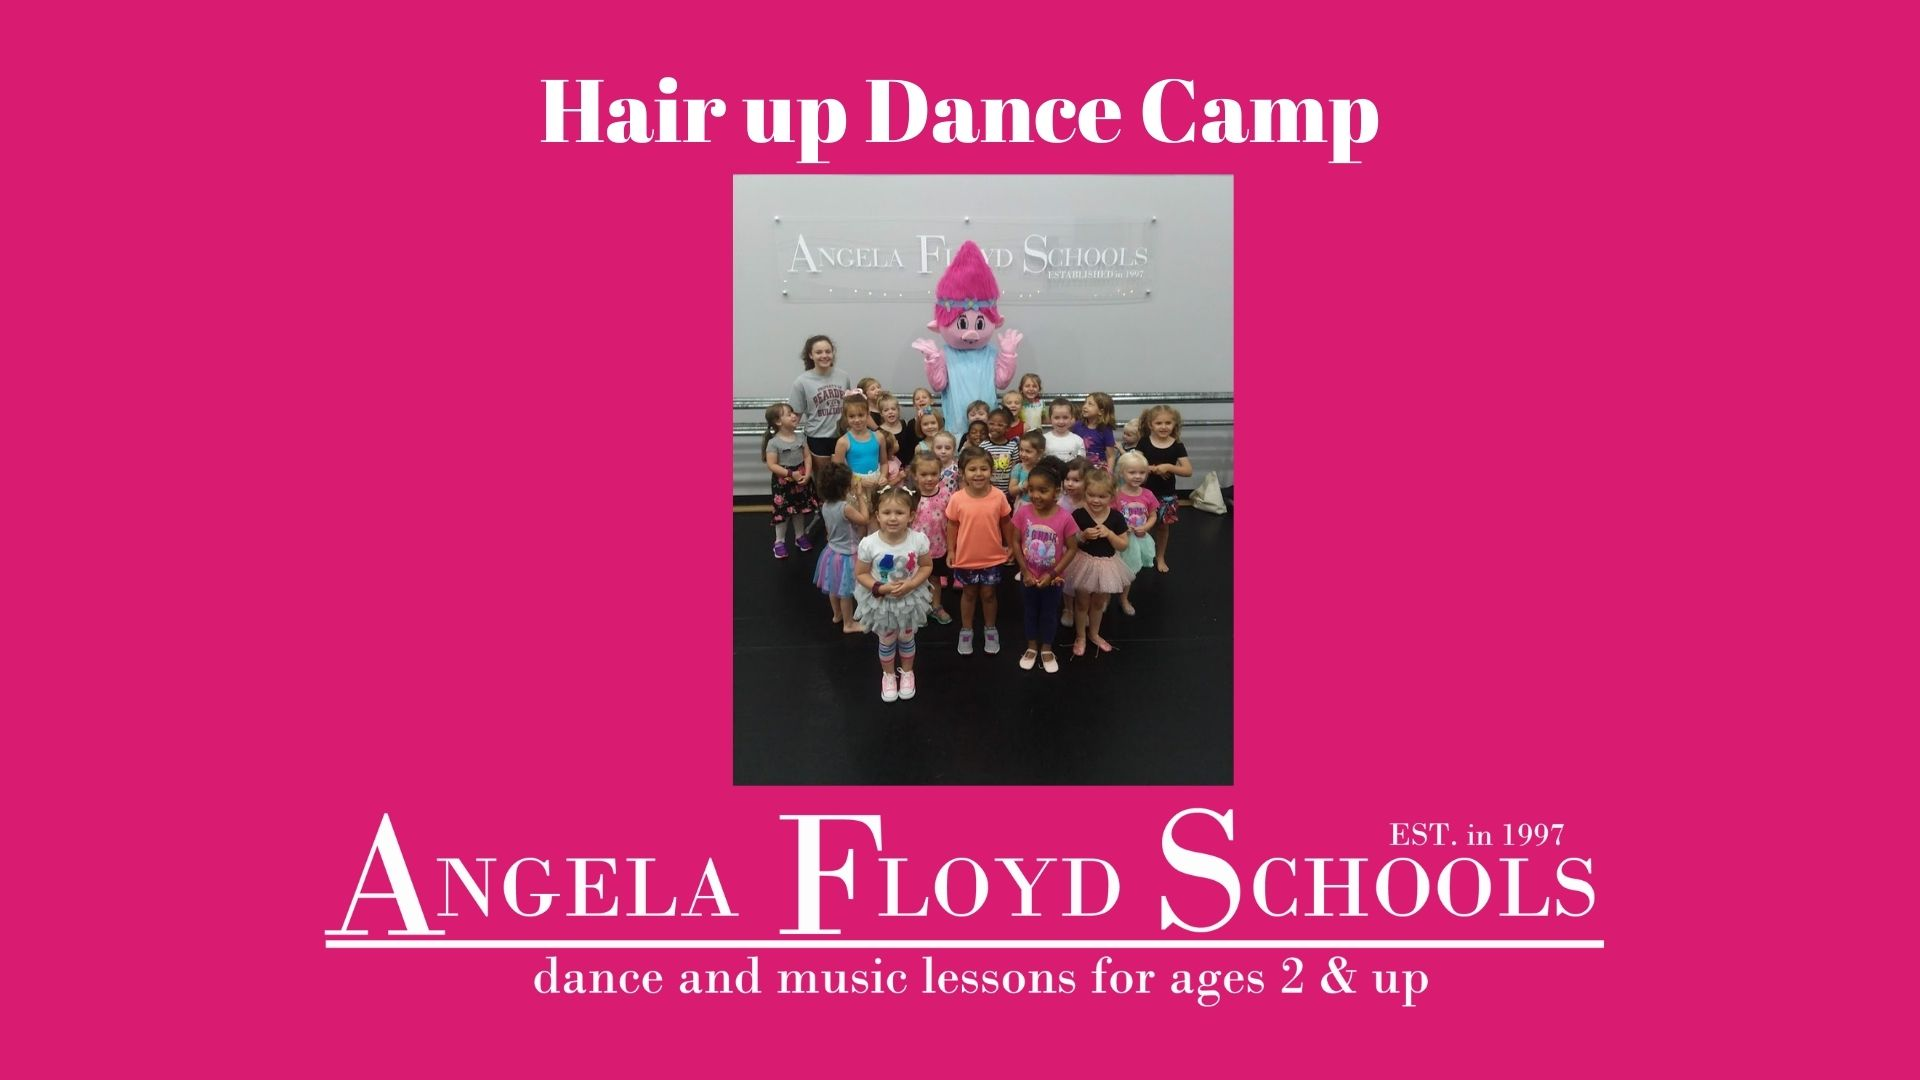 Hair Up Dance Camp